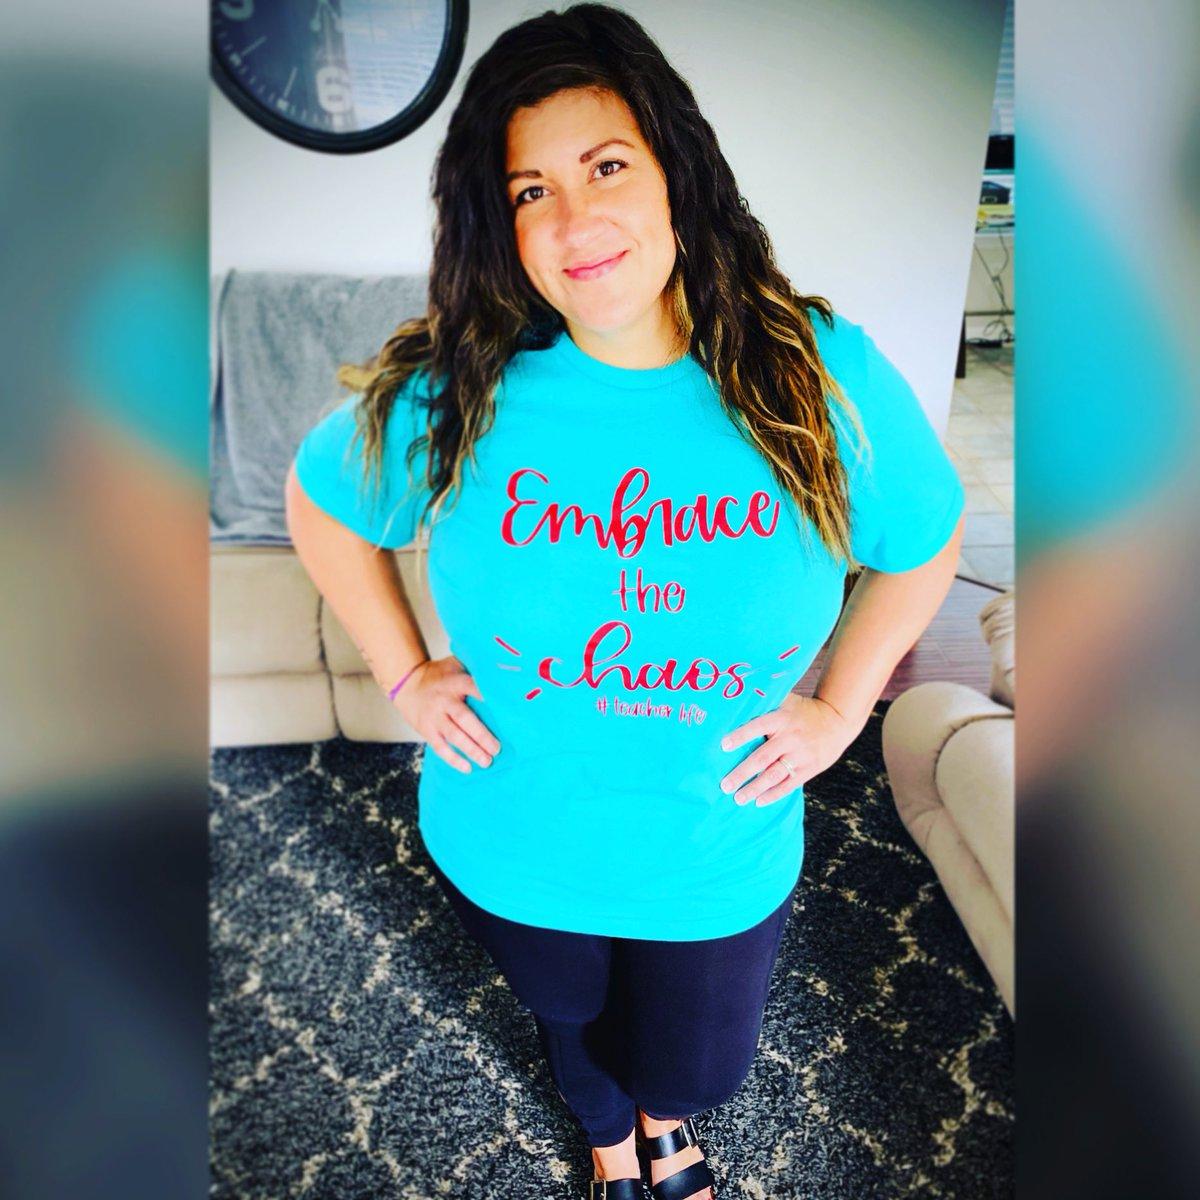 #EmbraceTheChaos #TeacherLife #WifeLife #MomLife #StepmomLife #GrammyTamiLife #HouseManagerLife #ITeachMiddles #ESOLTeacher #ELLs #ESOL #MiddleSchoolTeacher @wschicspic.twitter.com/6k5TL1dEYW